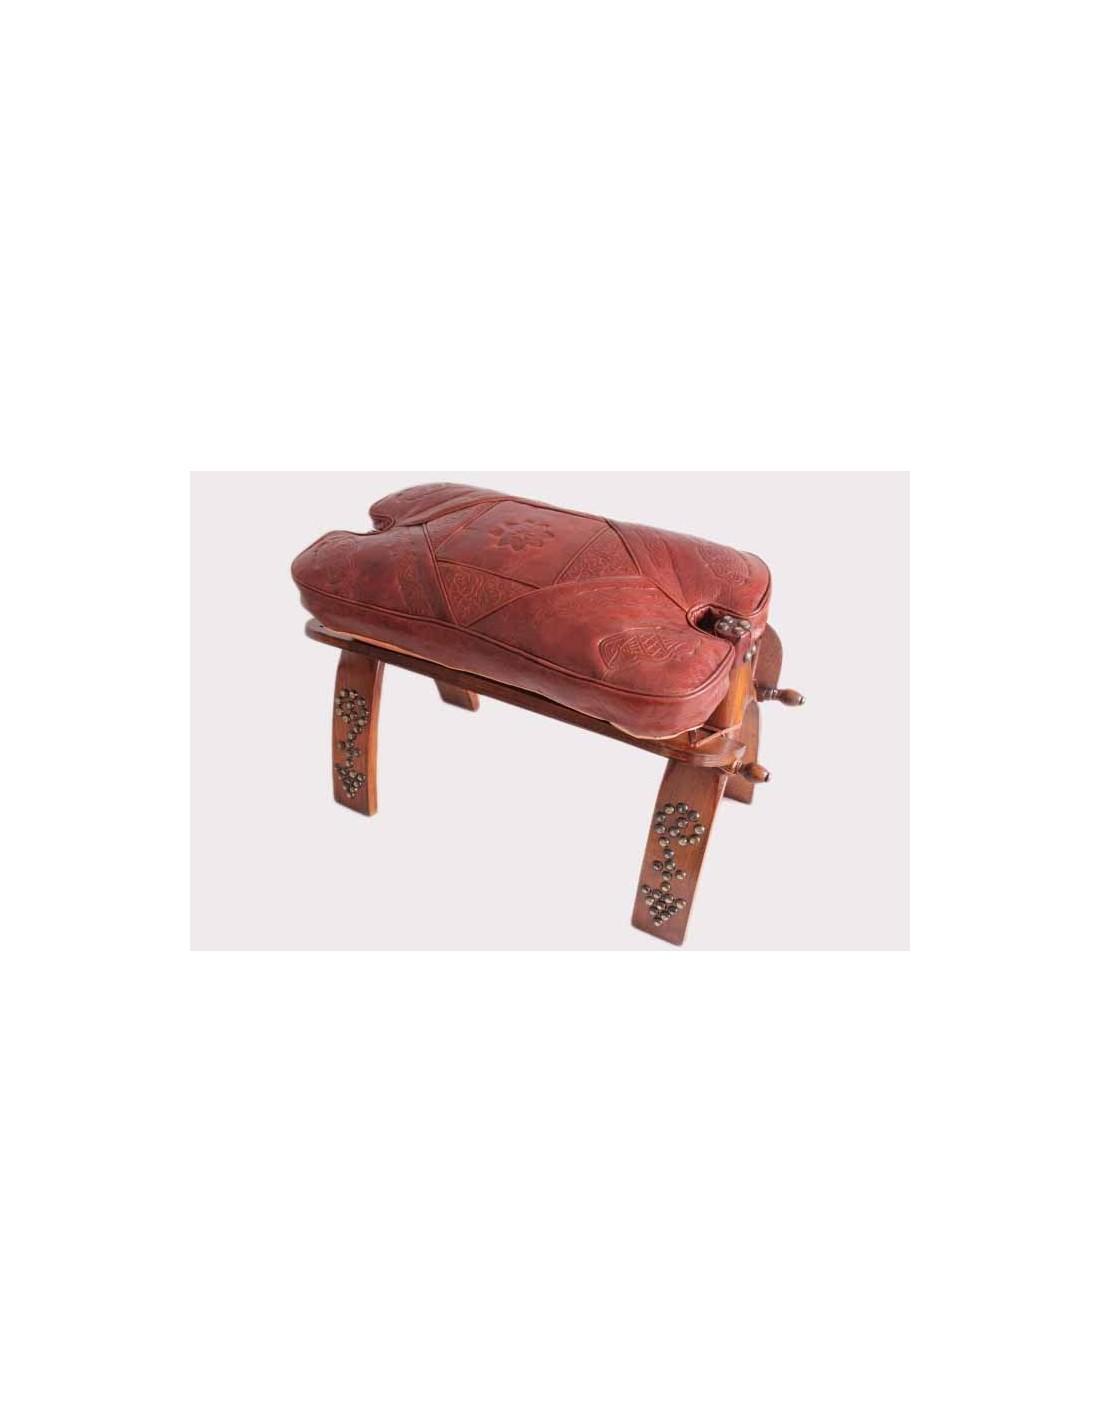 chaise en bois et cuir la medina shop. Black Bedroom Furniture Sets. Home Design Ideas